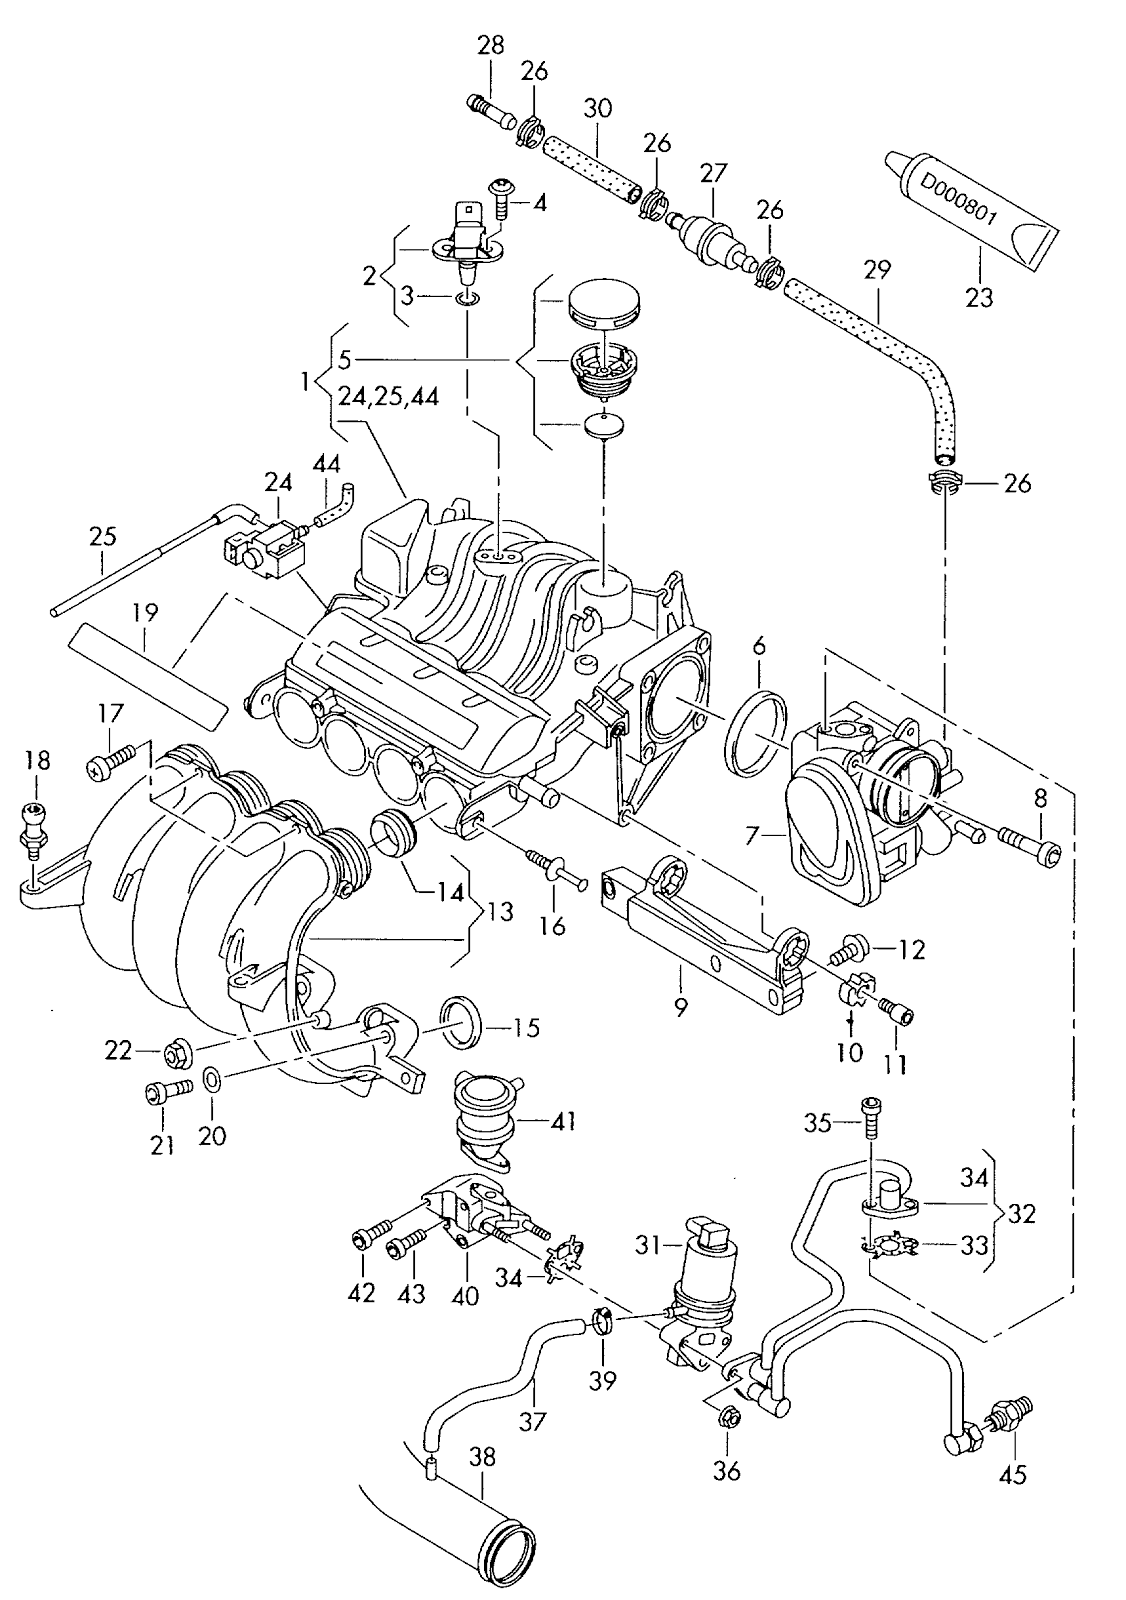 Vw Golf 5 1 6ltr Bgu Throttle Valve Control Element